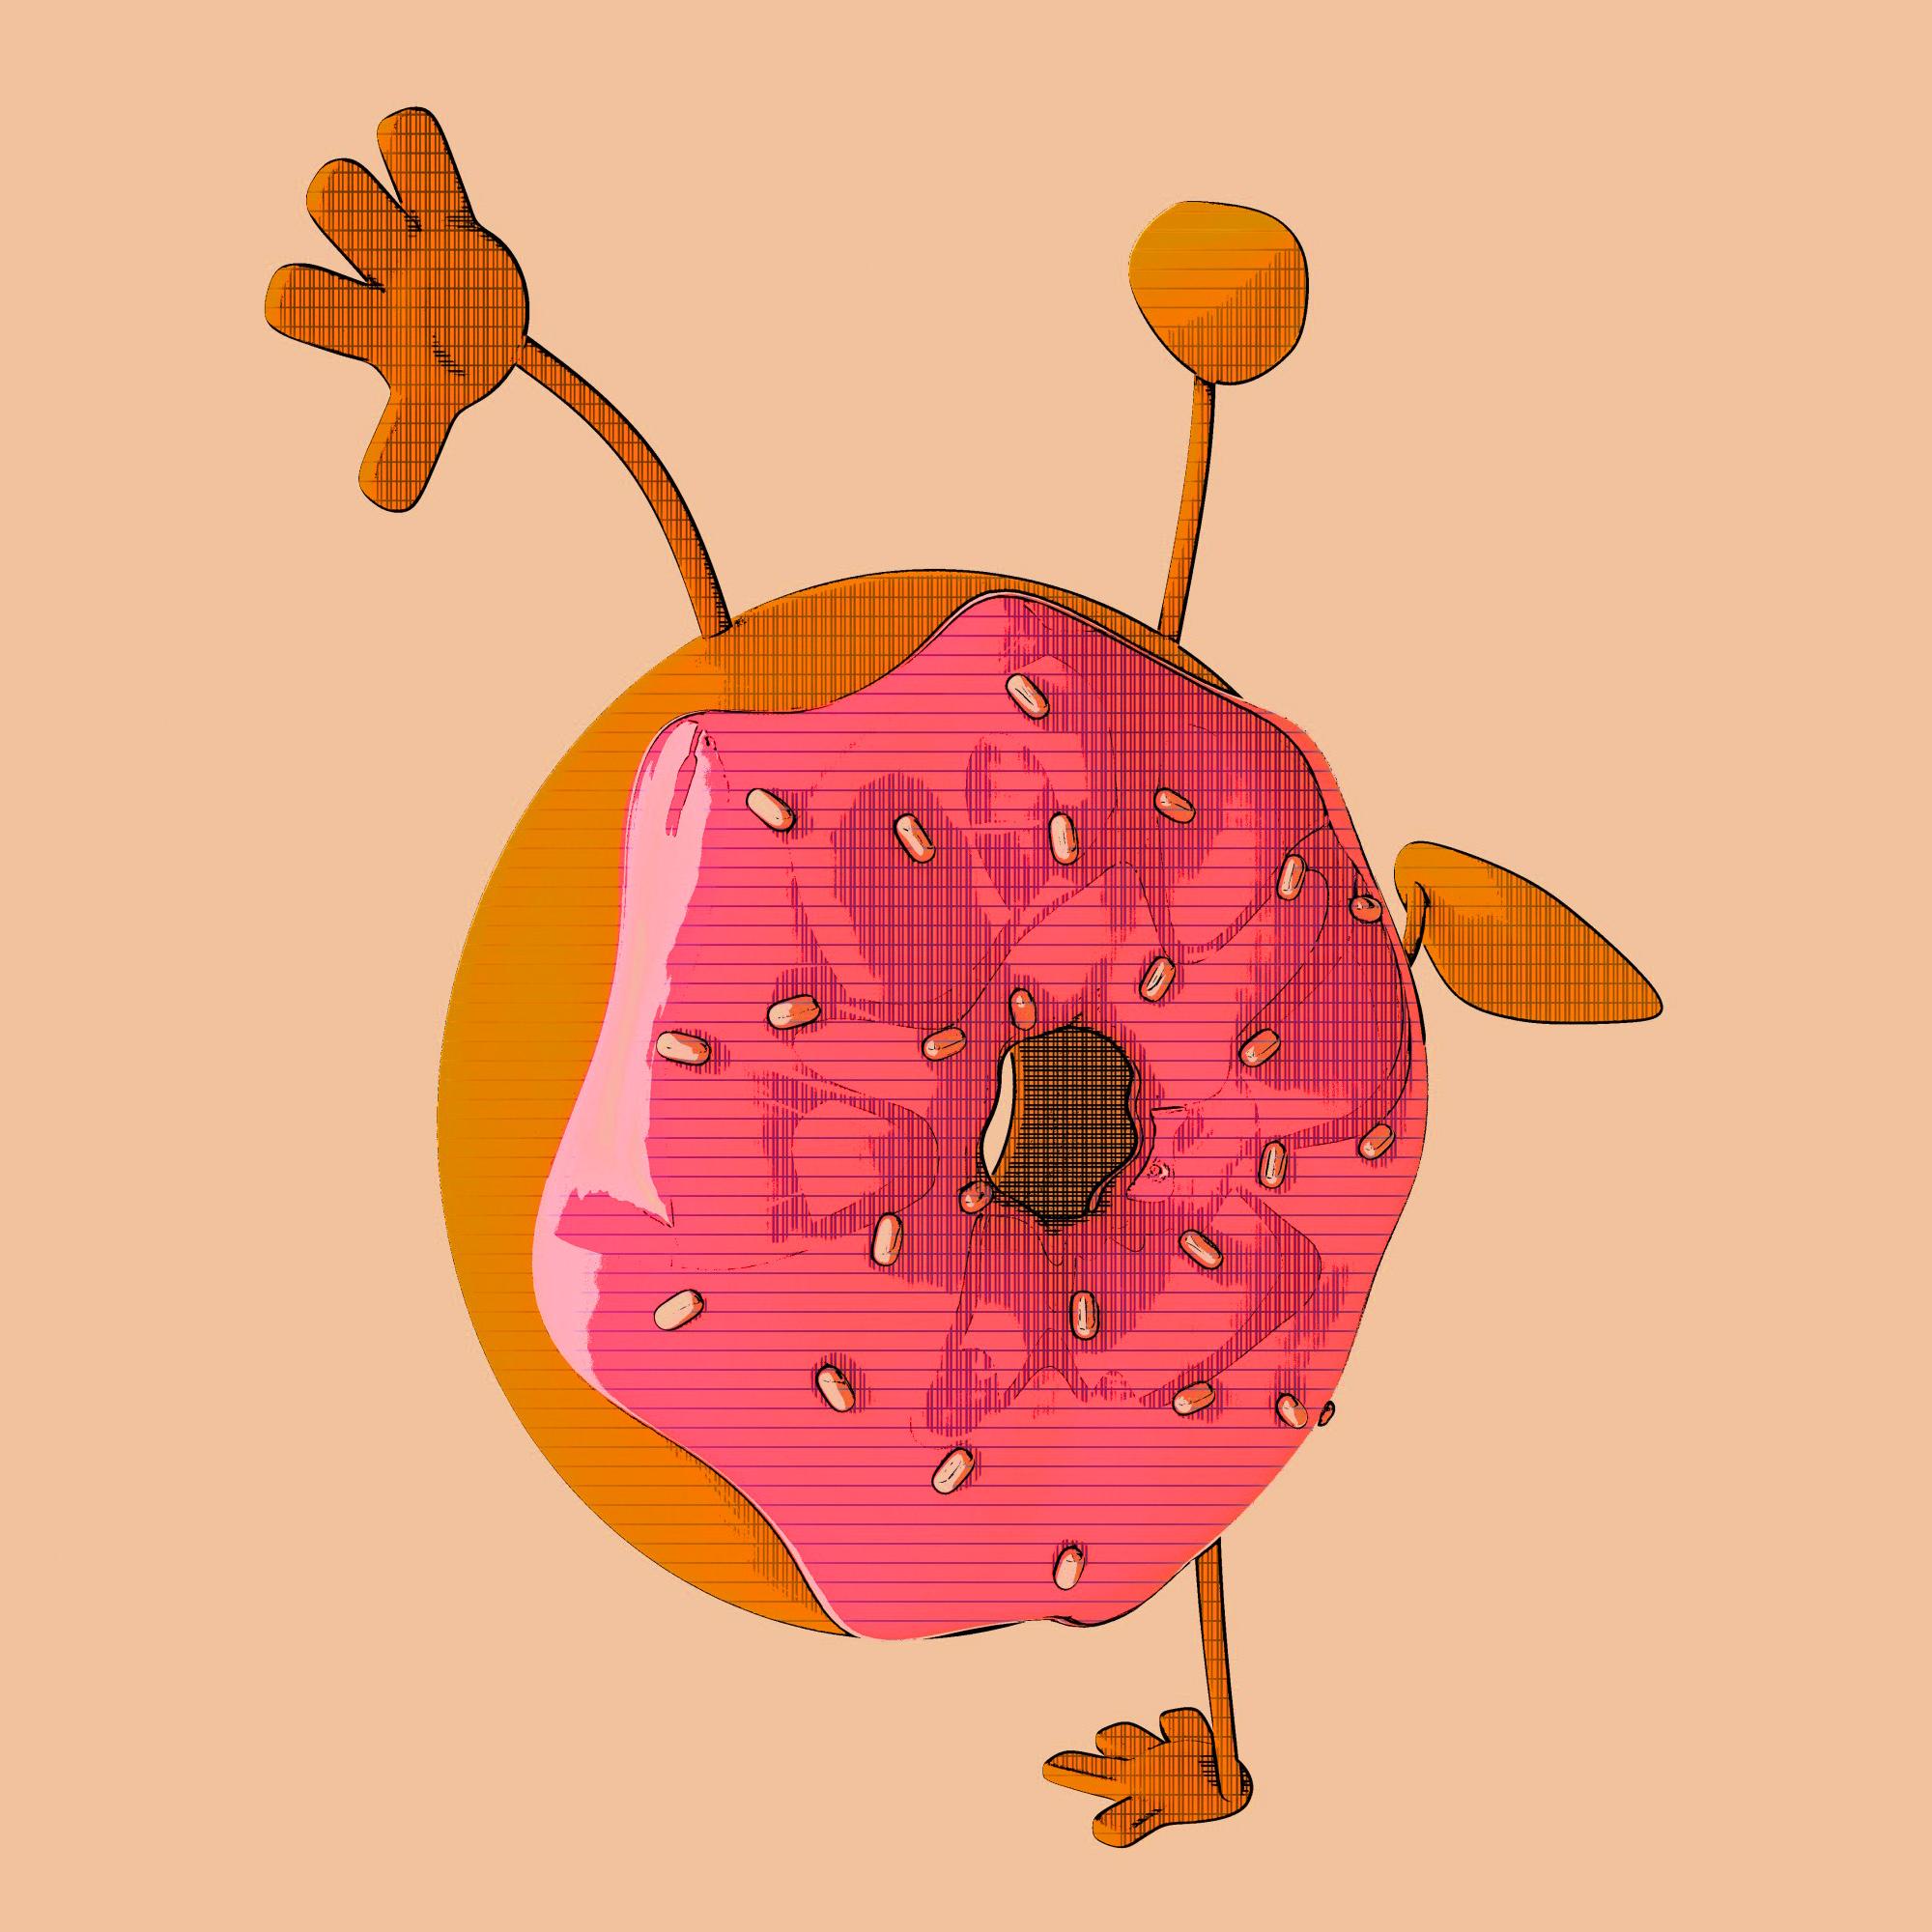 Donut, 3d, Eat, Treat, Tasty, HQ Photo